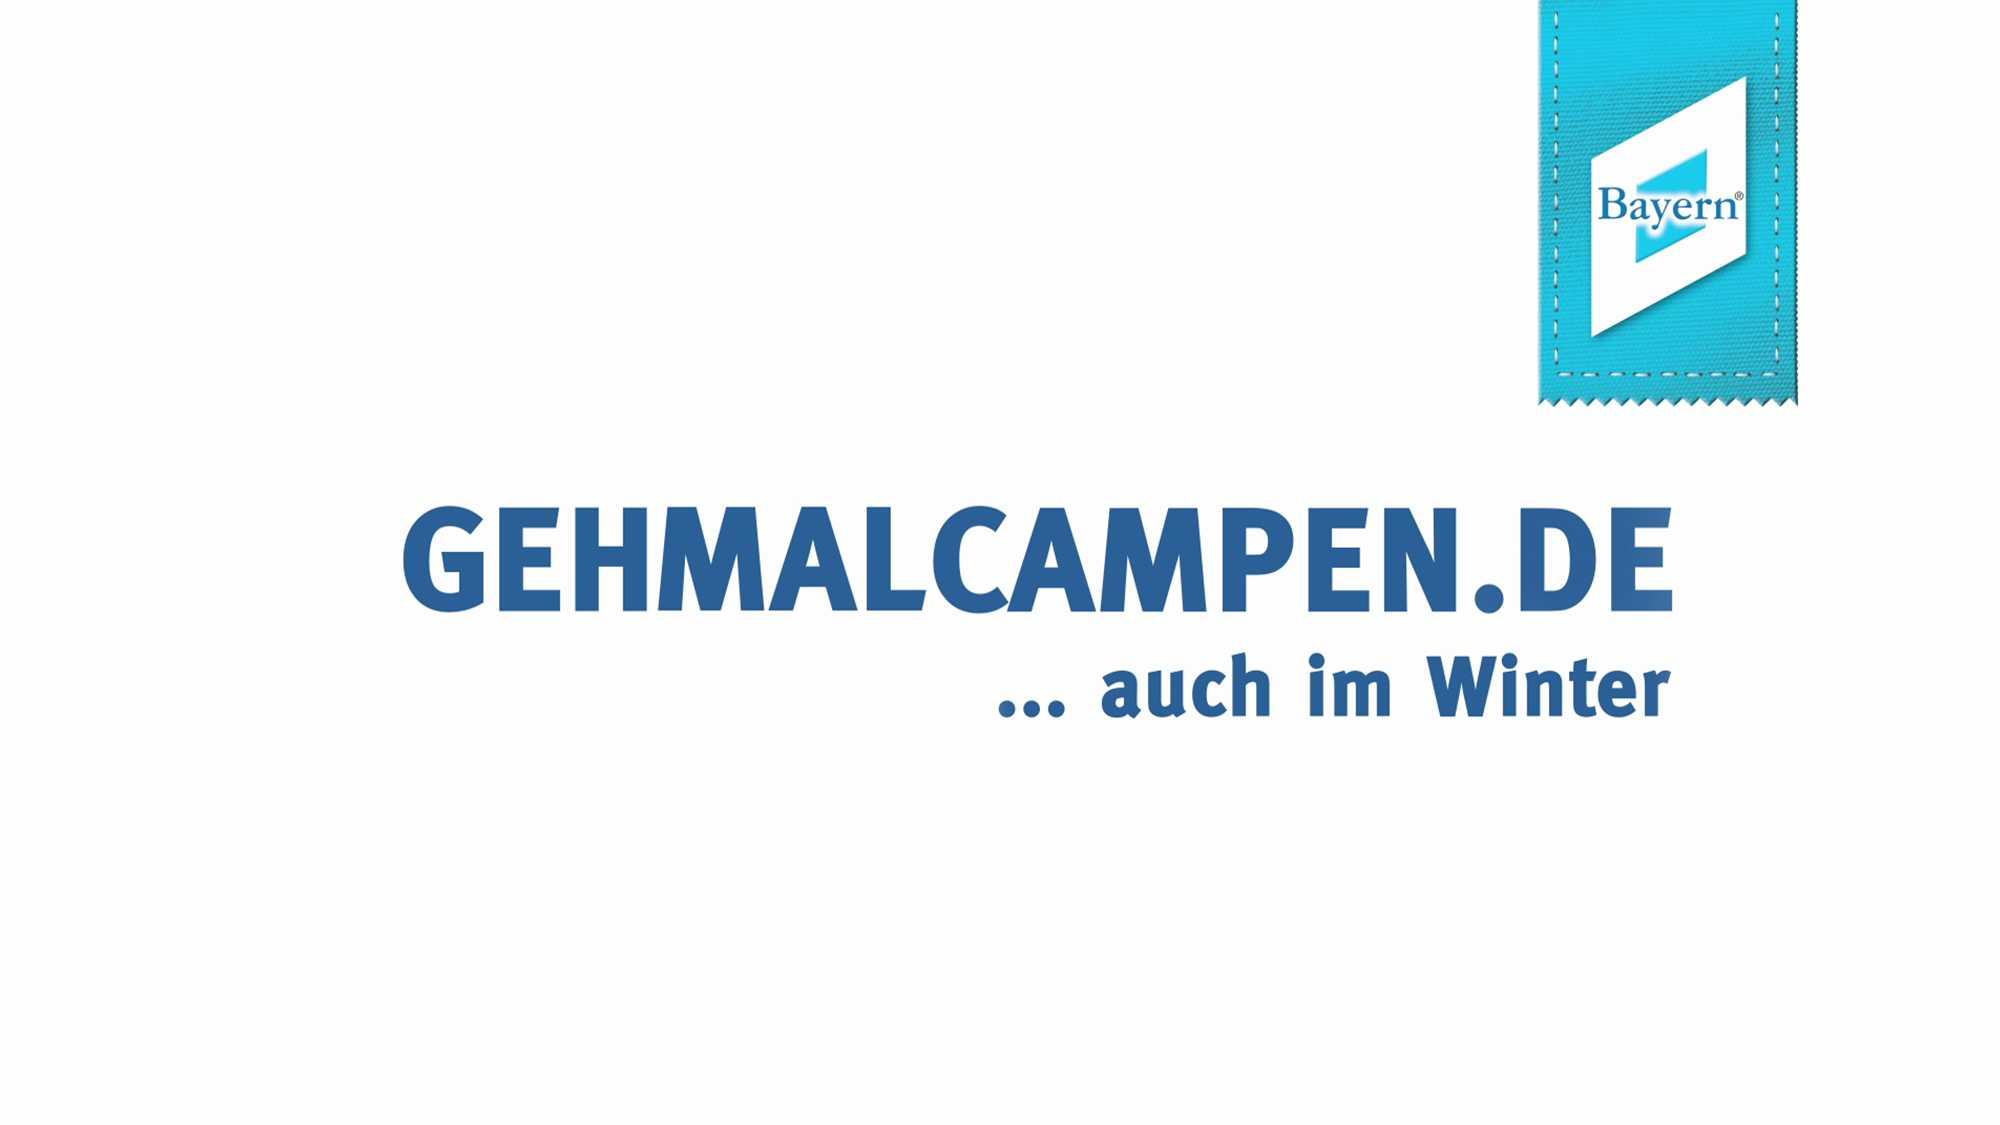 Bayerntourismus Wintercamping in Bayern